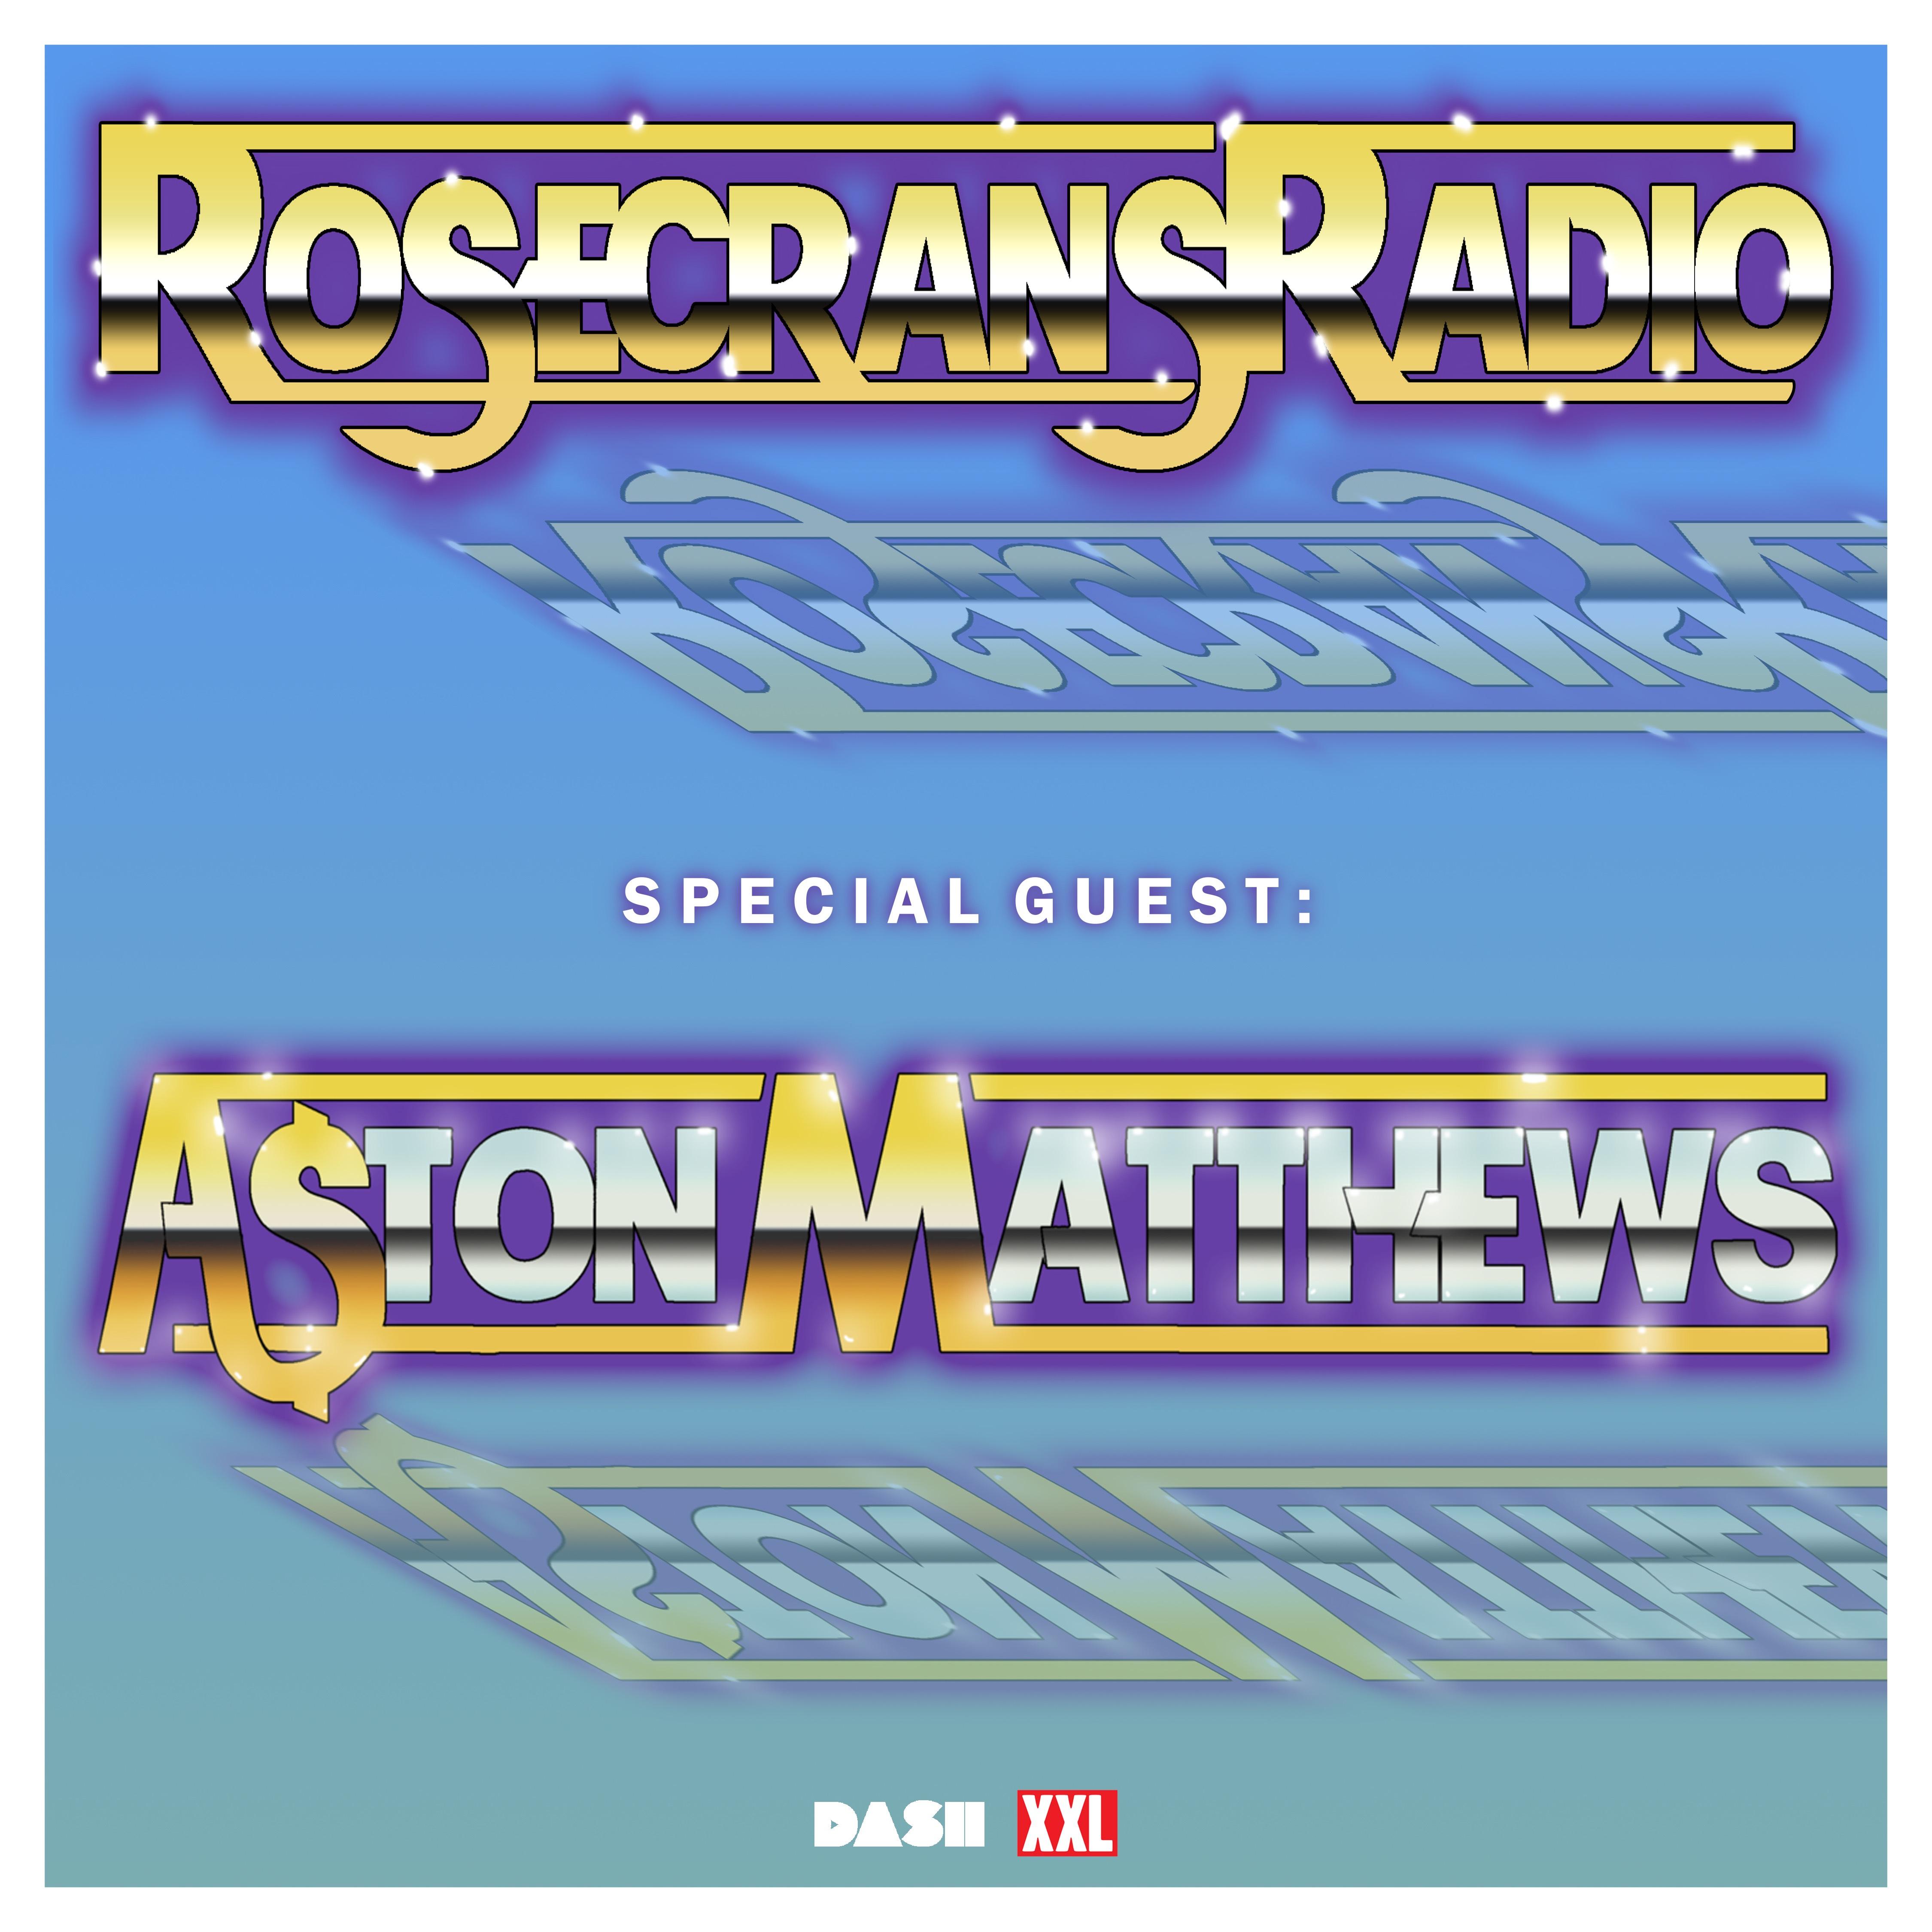 Rosecrans Radio 043 With Cypress Moreno Featuring Aston Matthews